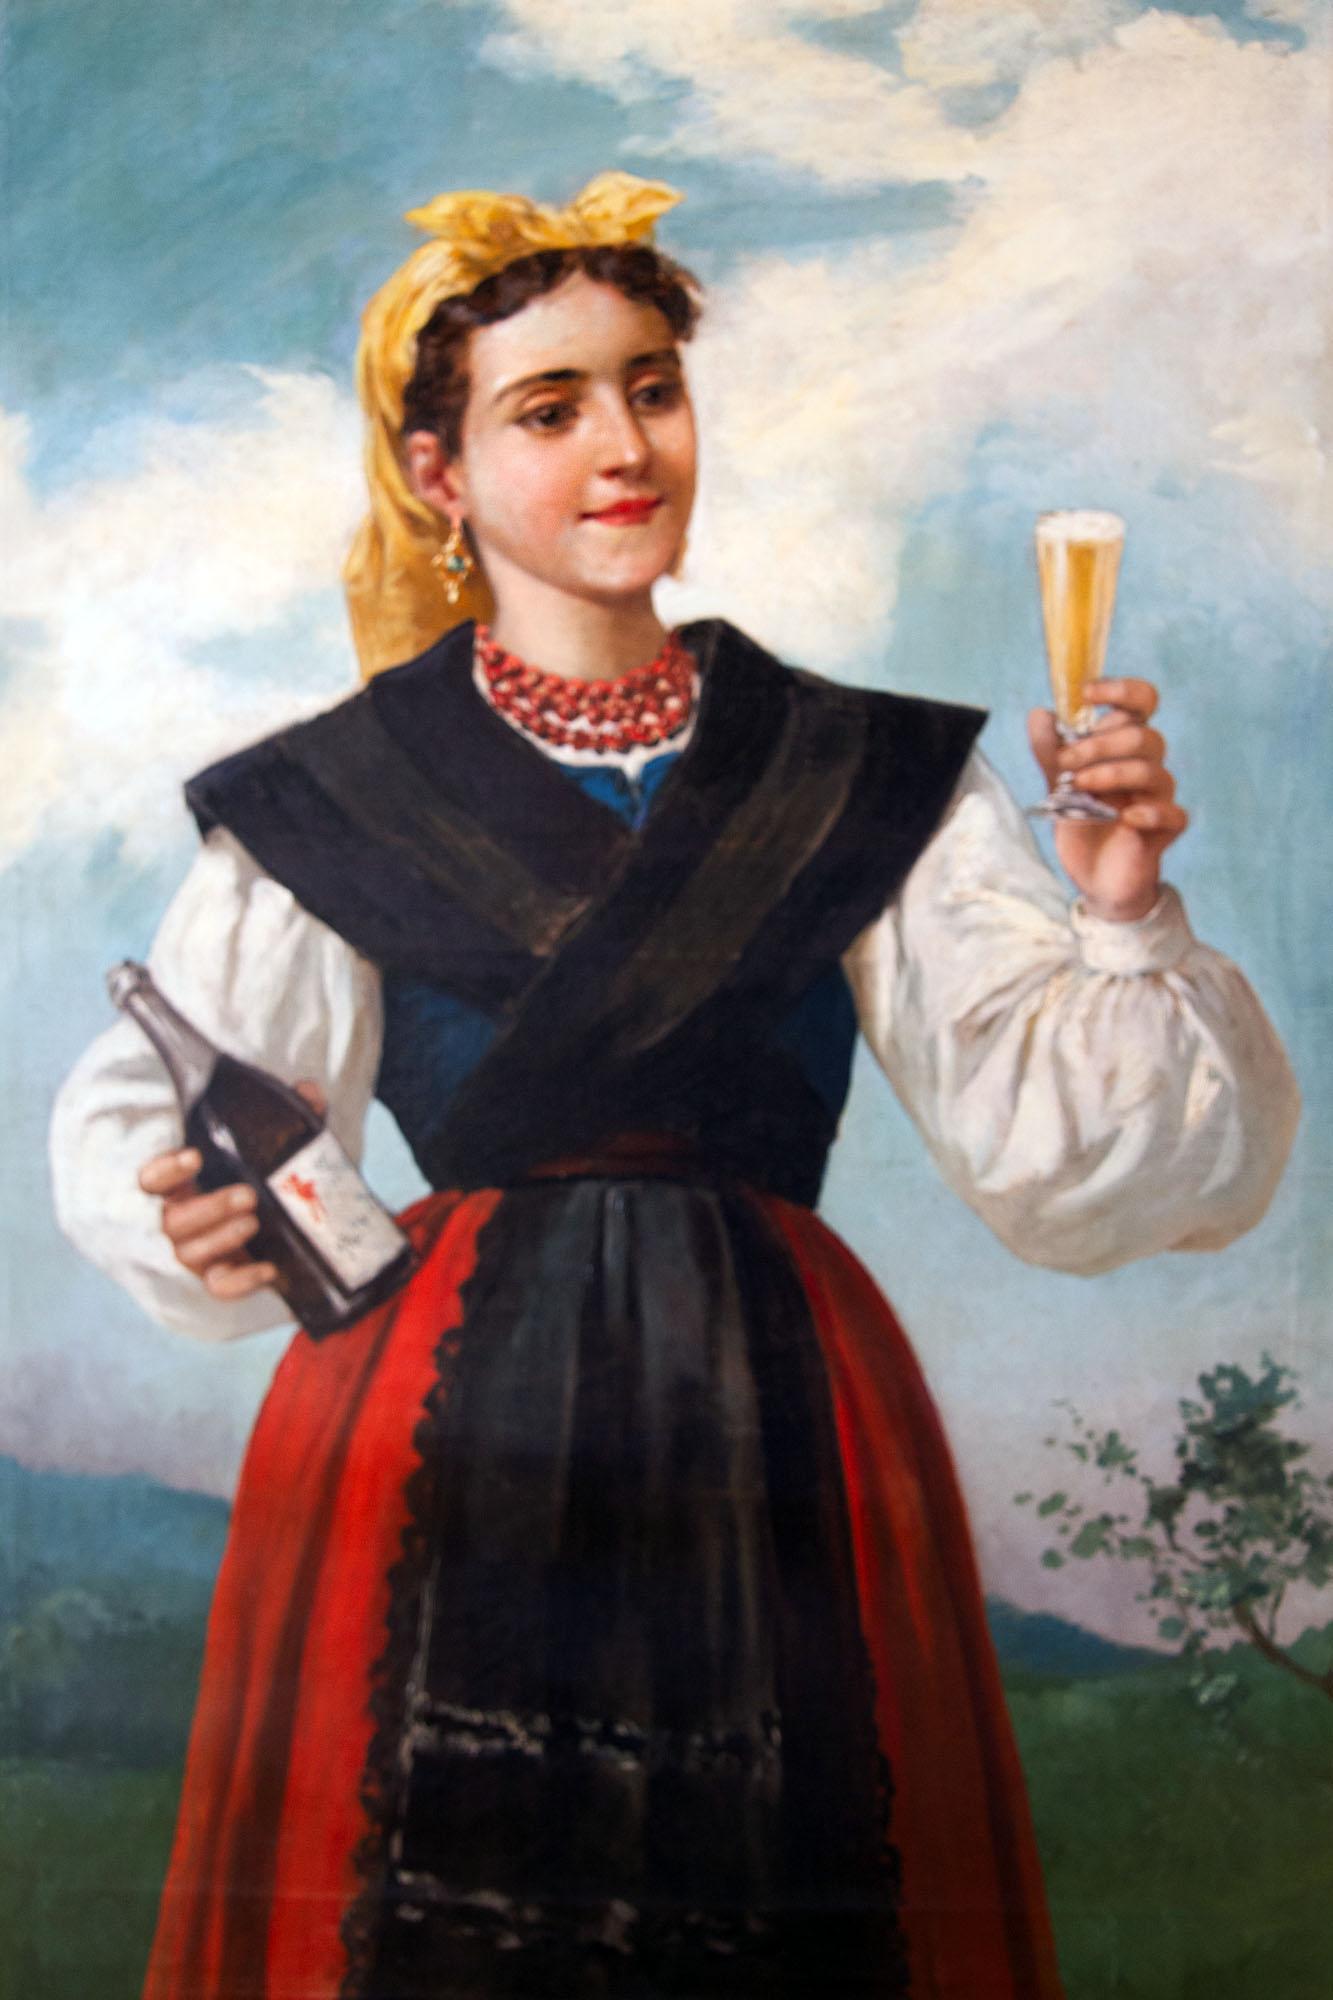 Asturias Woman Drinking Sparkling Cider